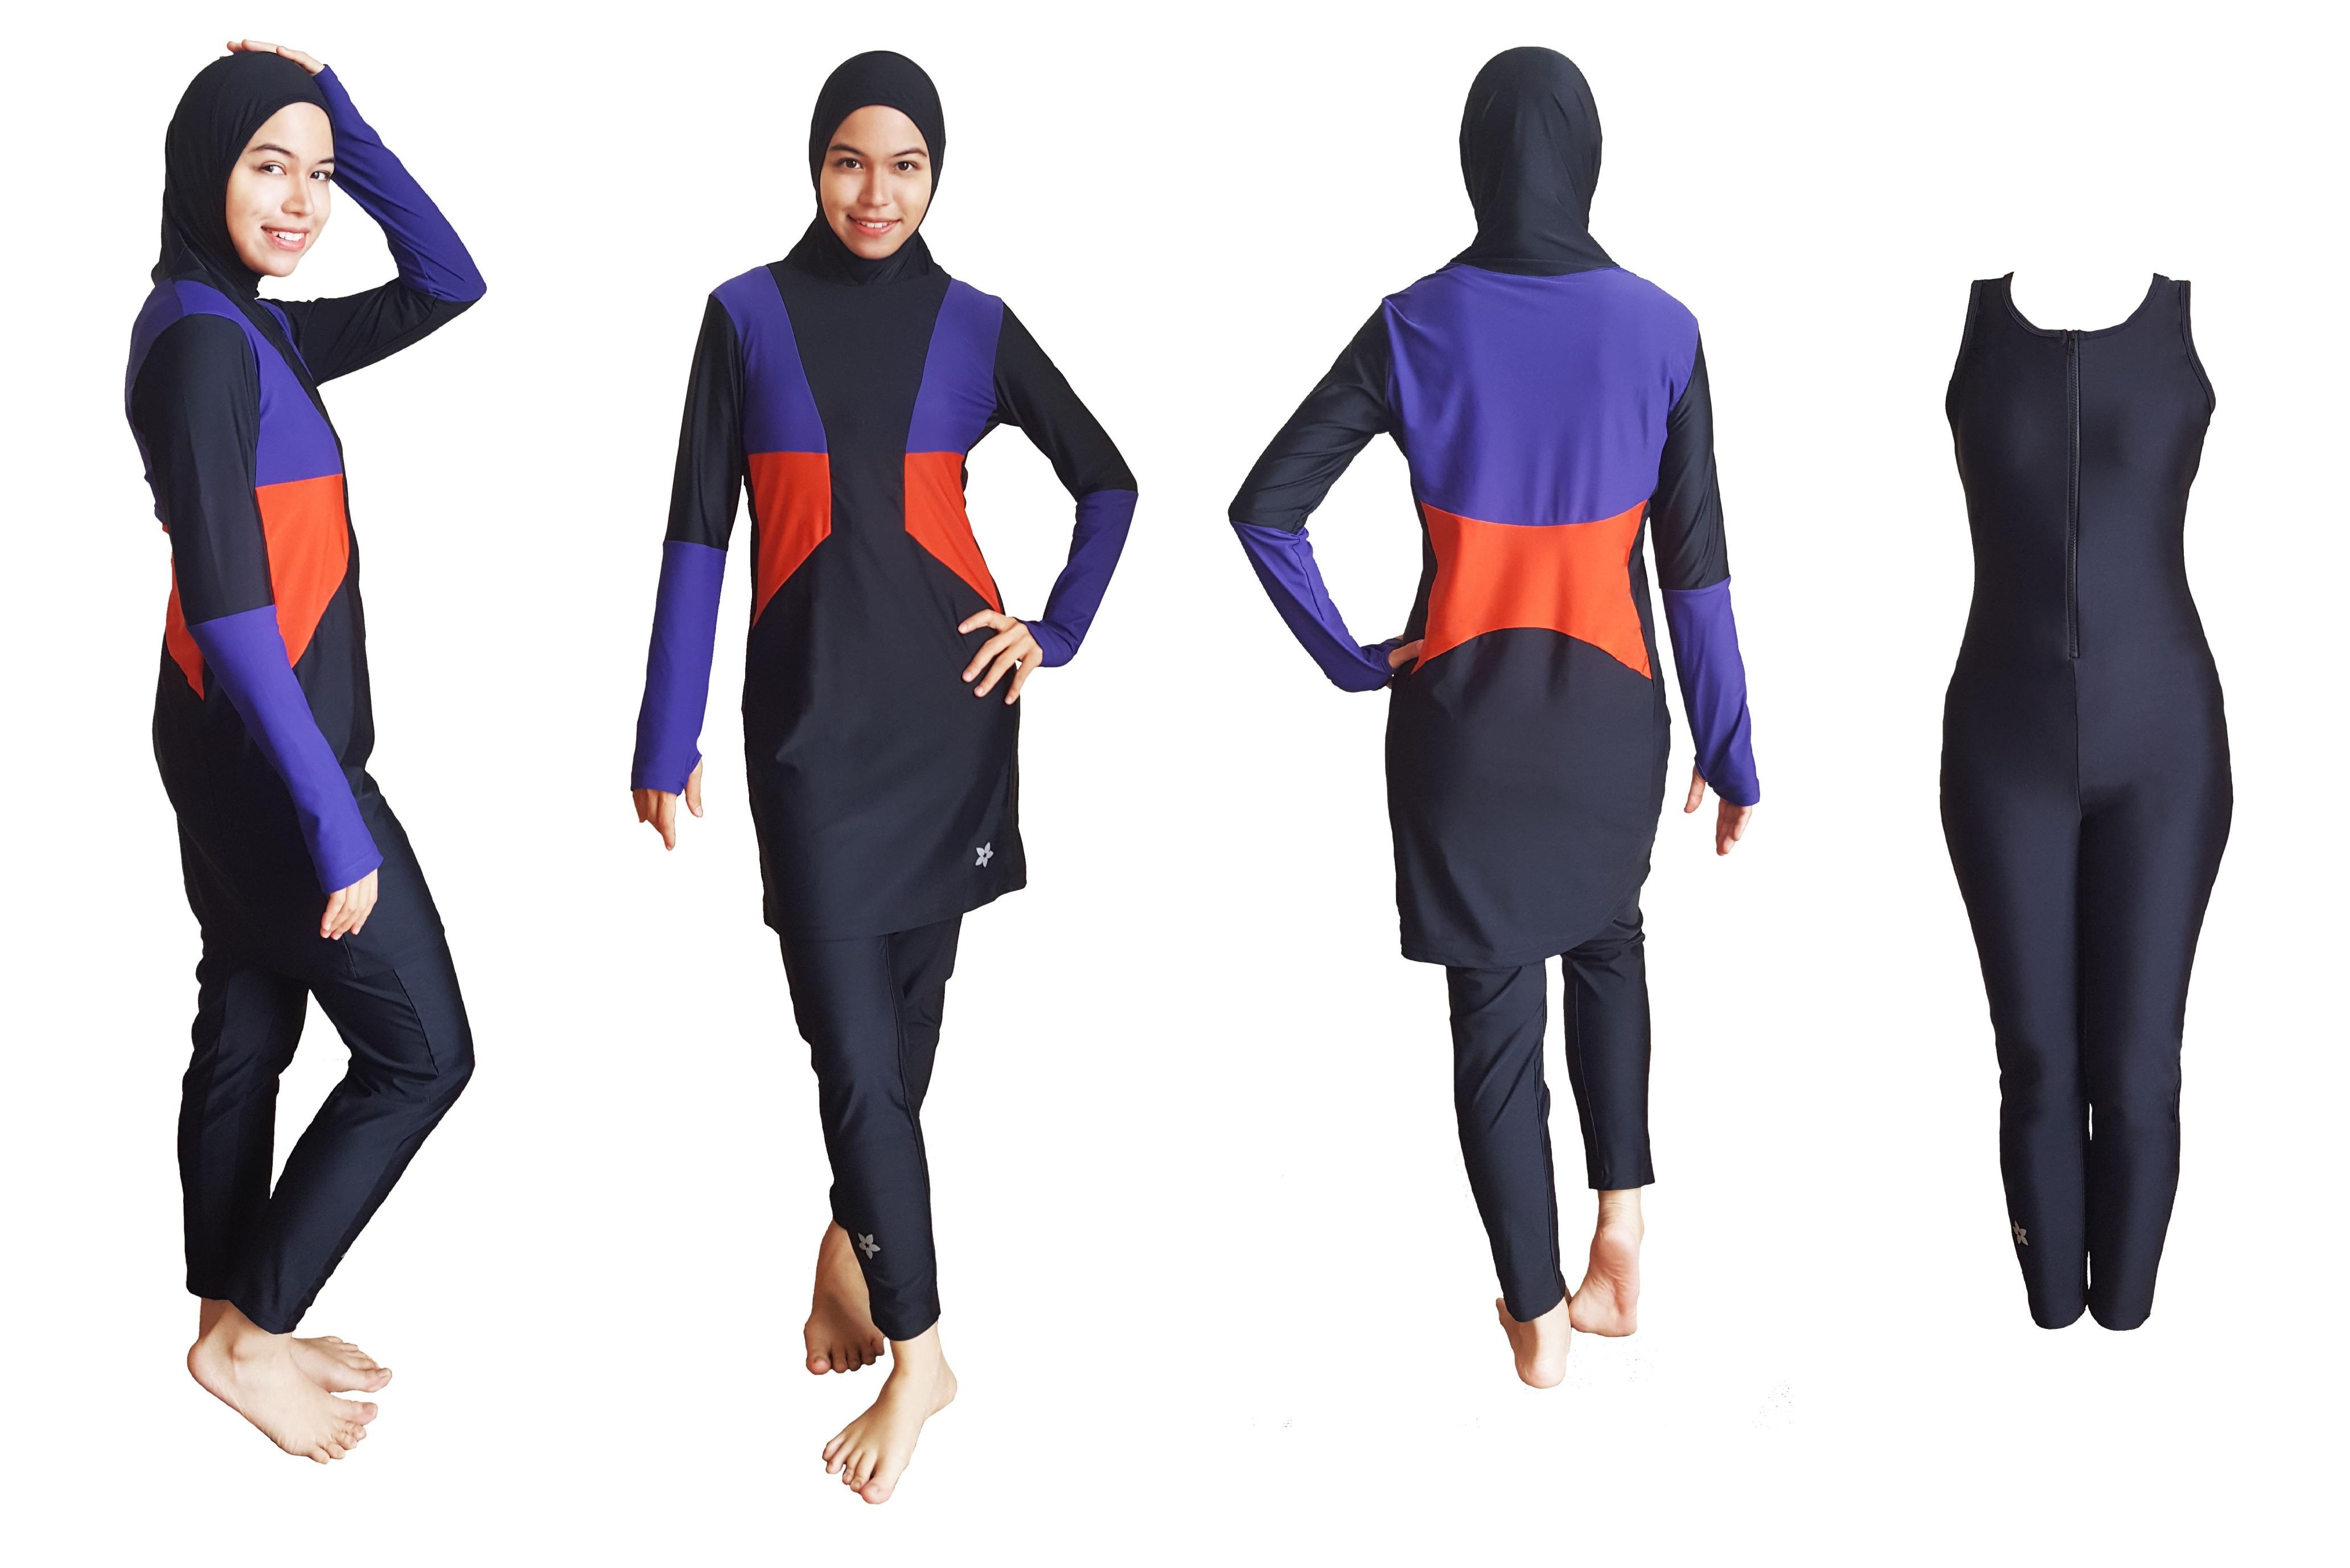 Nashata Swimwear